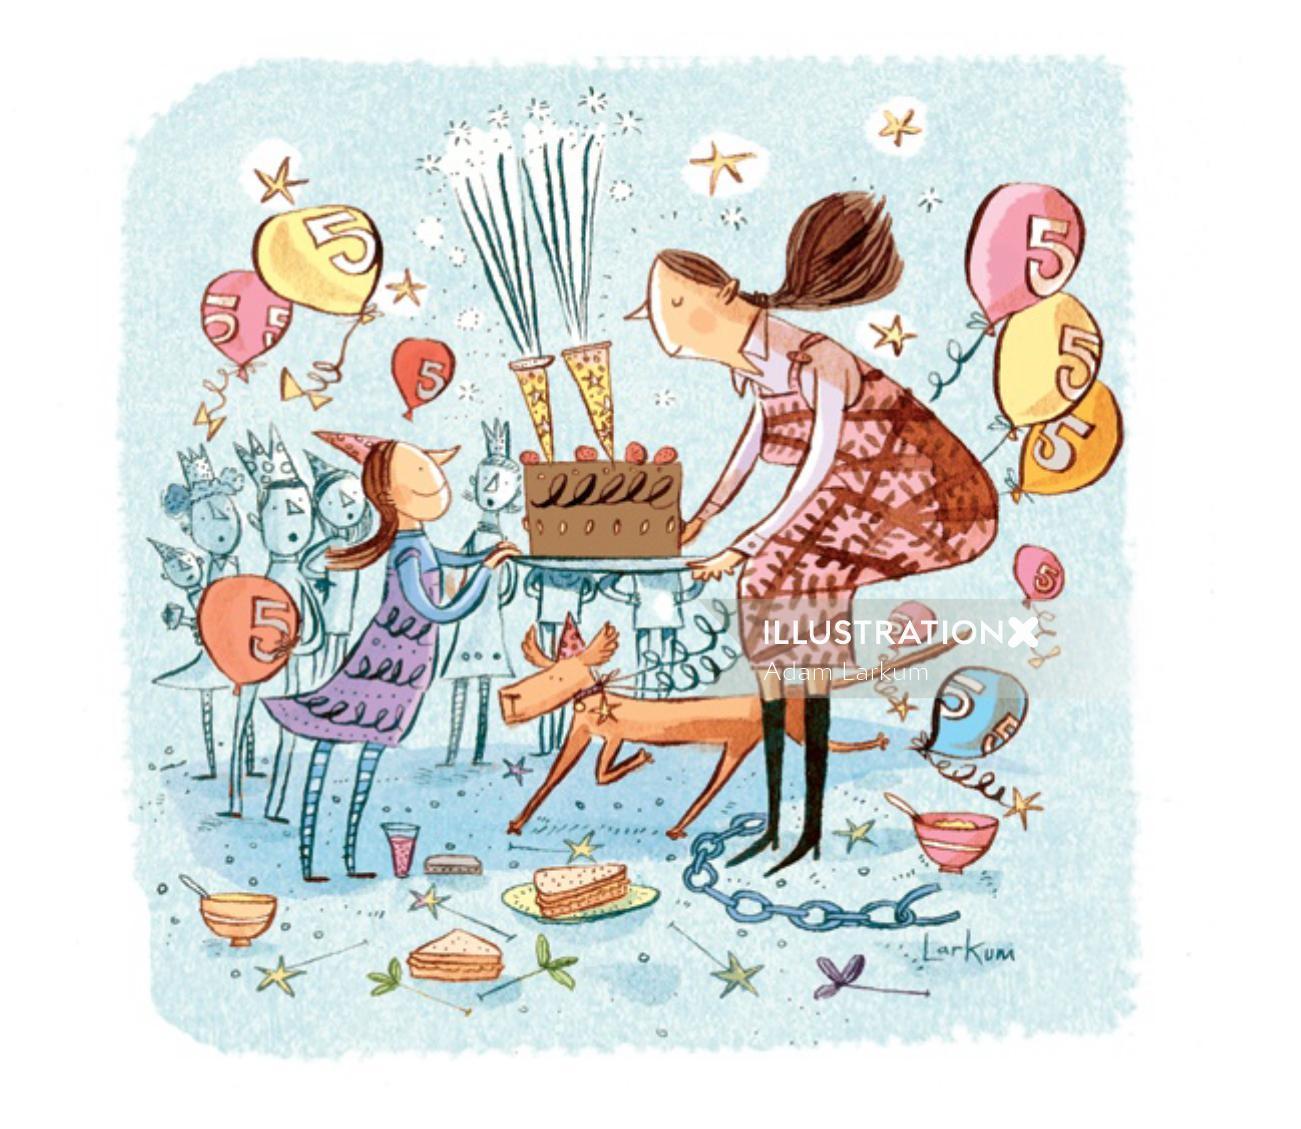 Birthday celebration illustration for Sunday Telegraph